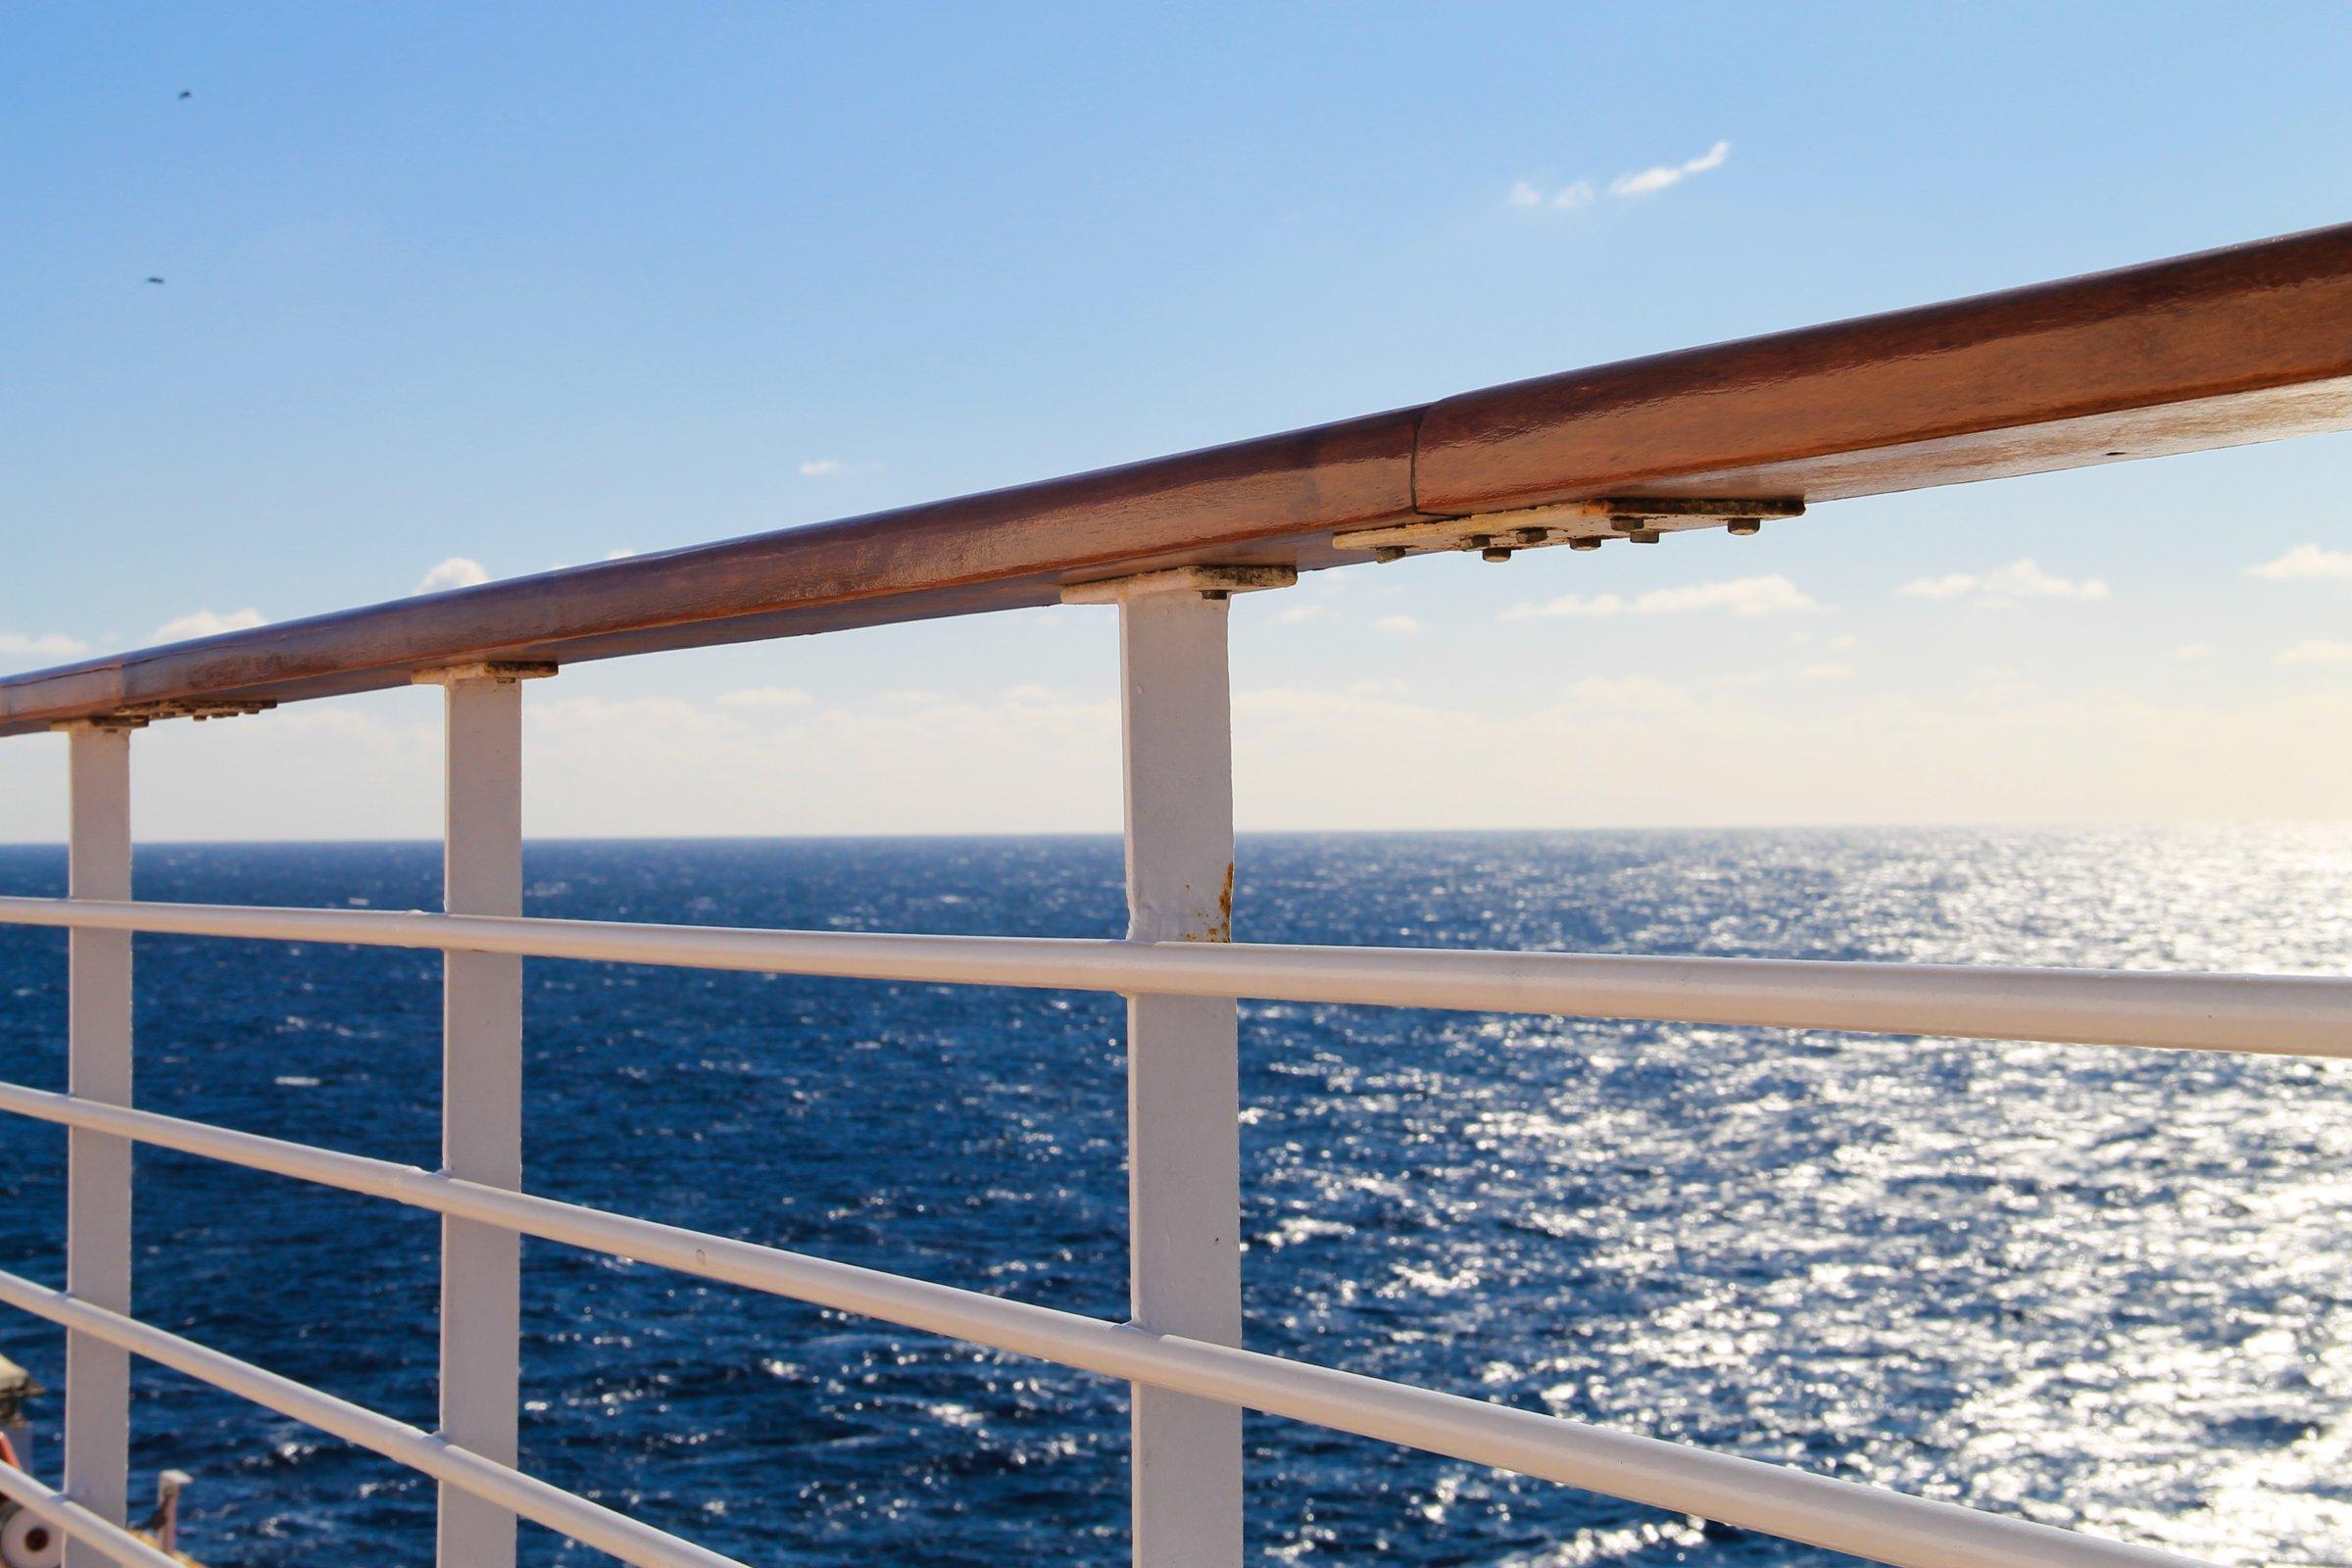 Ship Railing on Open Ocean & Sky